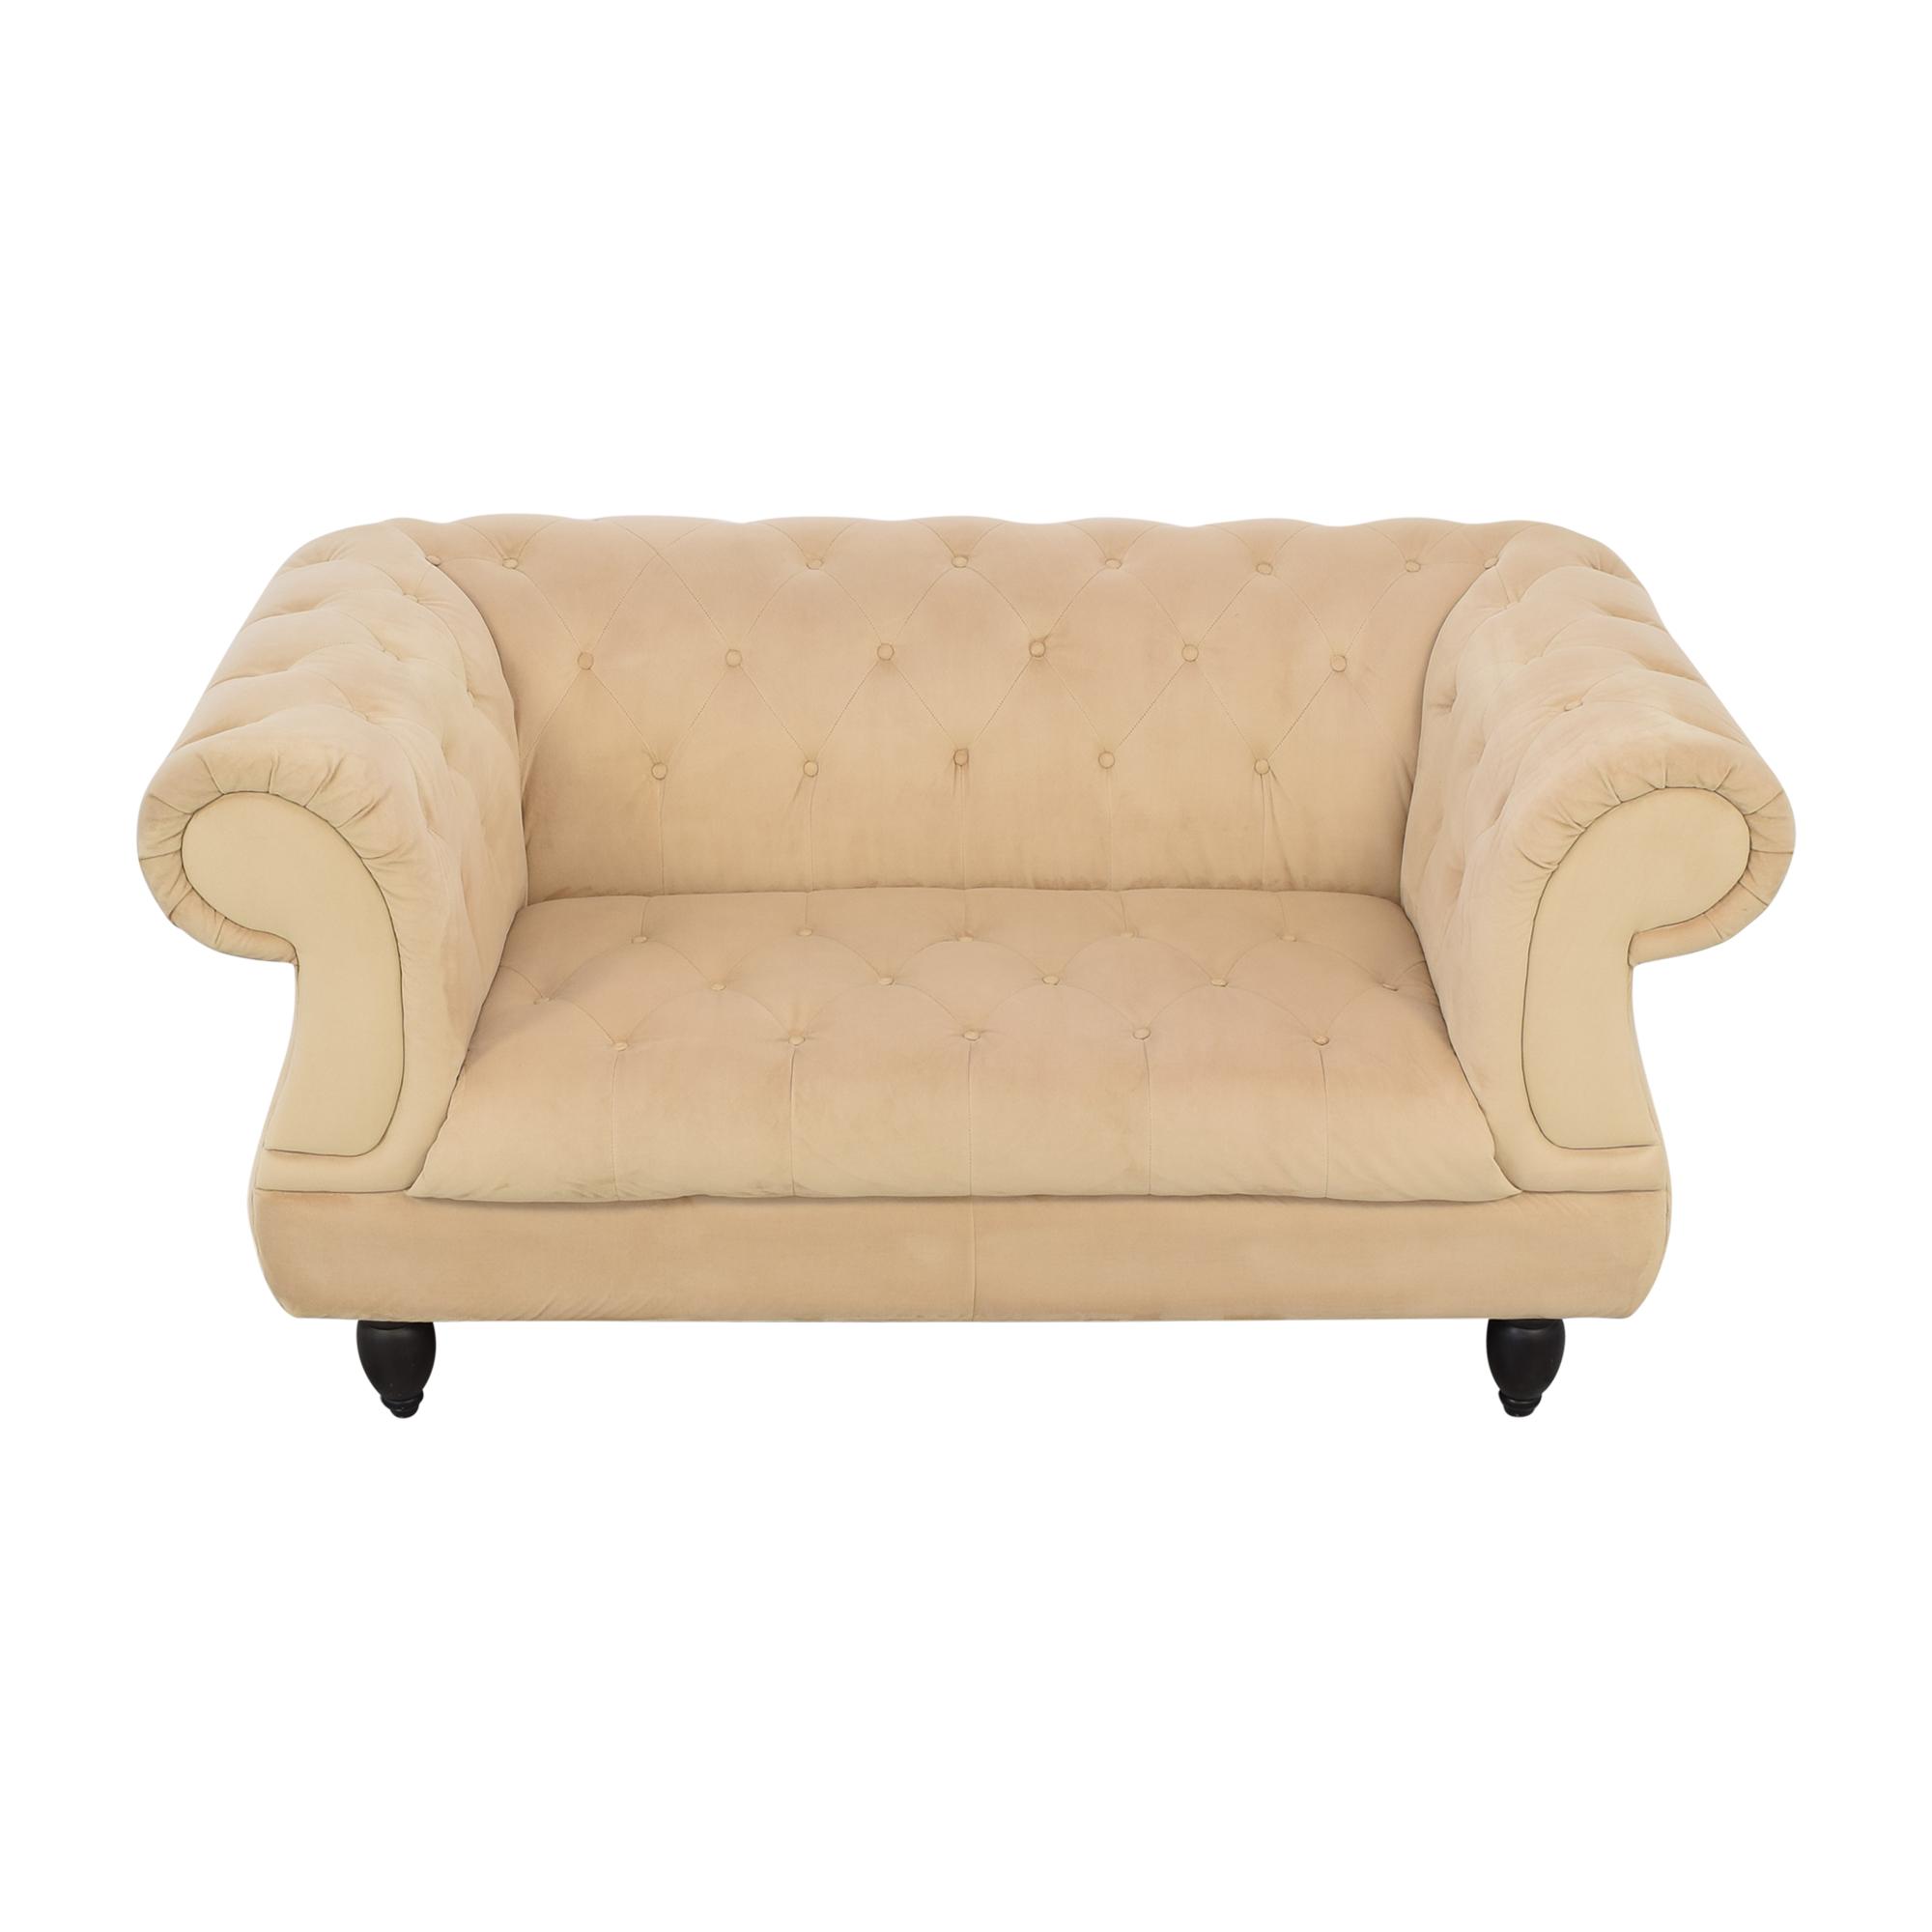 Raymour & Flanigan Chesterfield Sofa / Classic Sofas